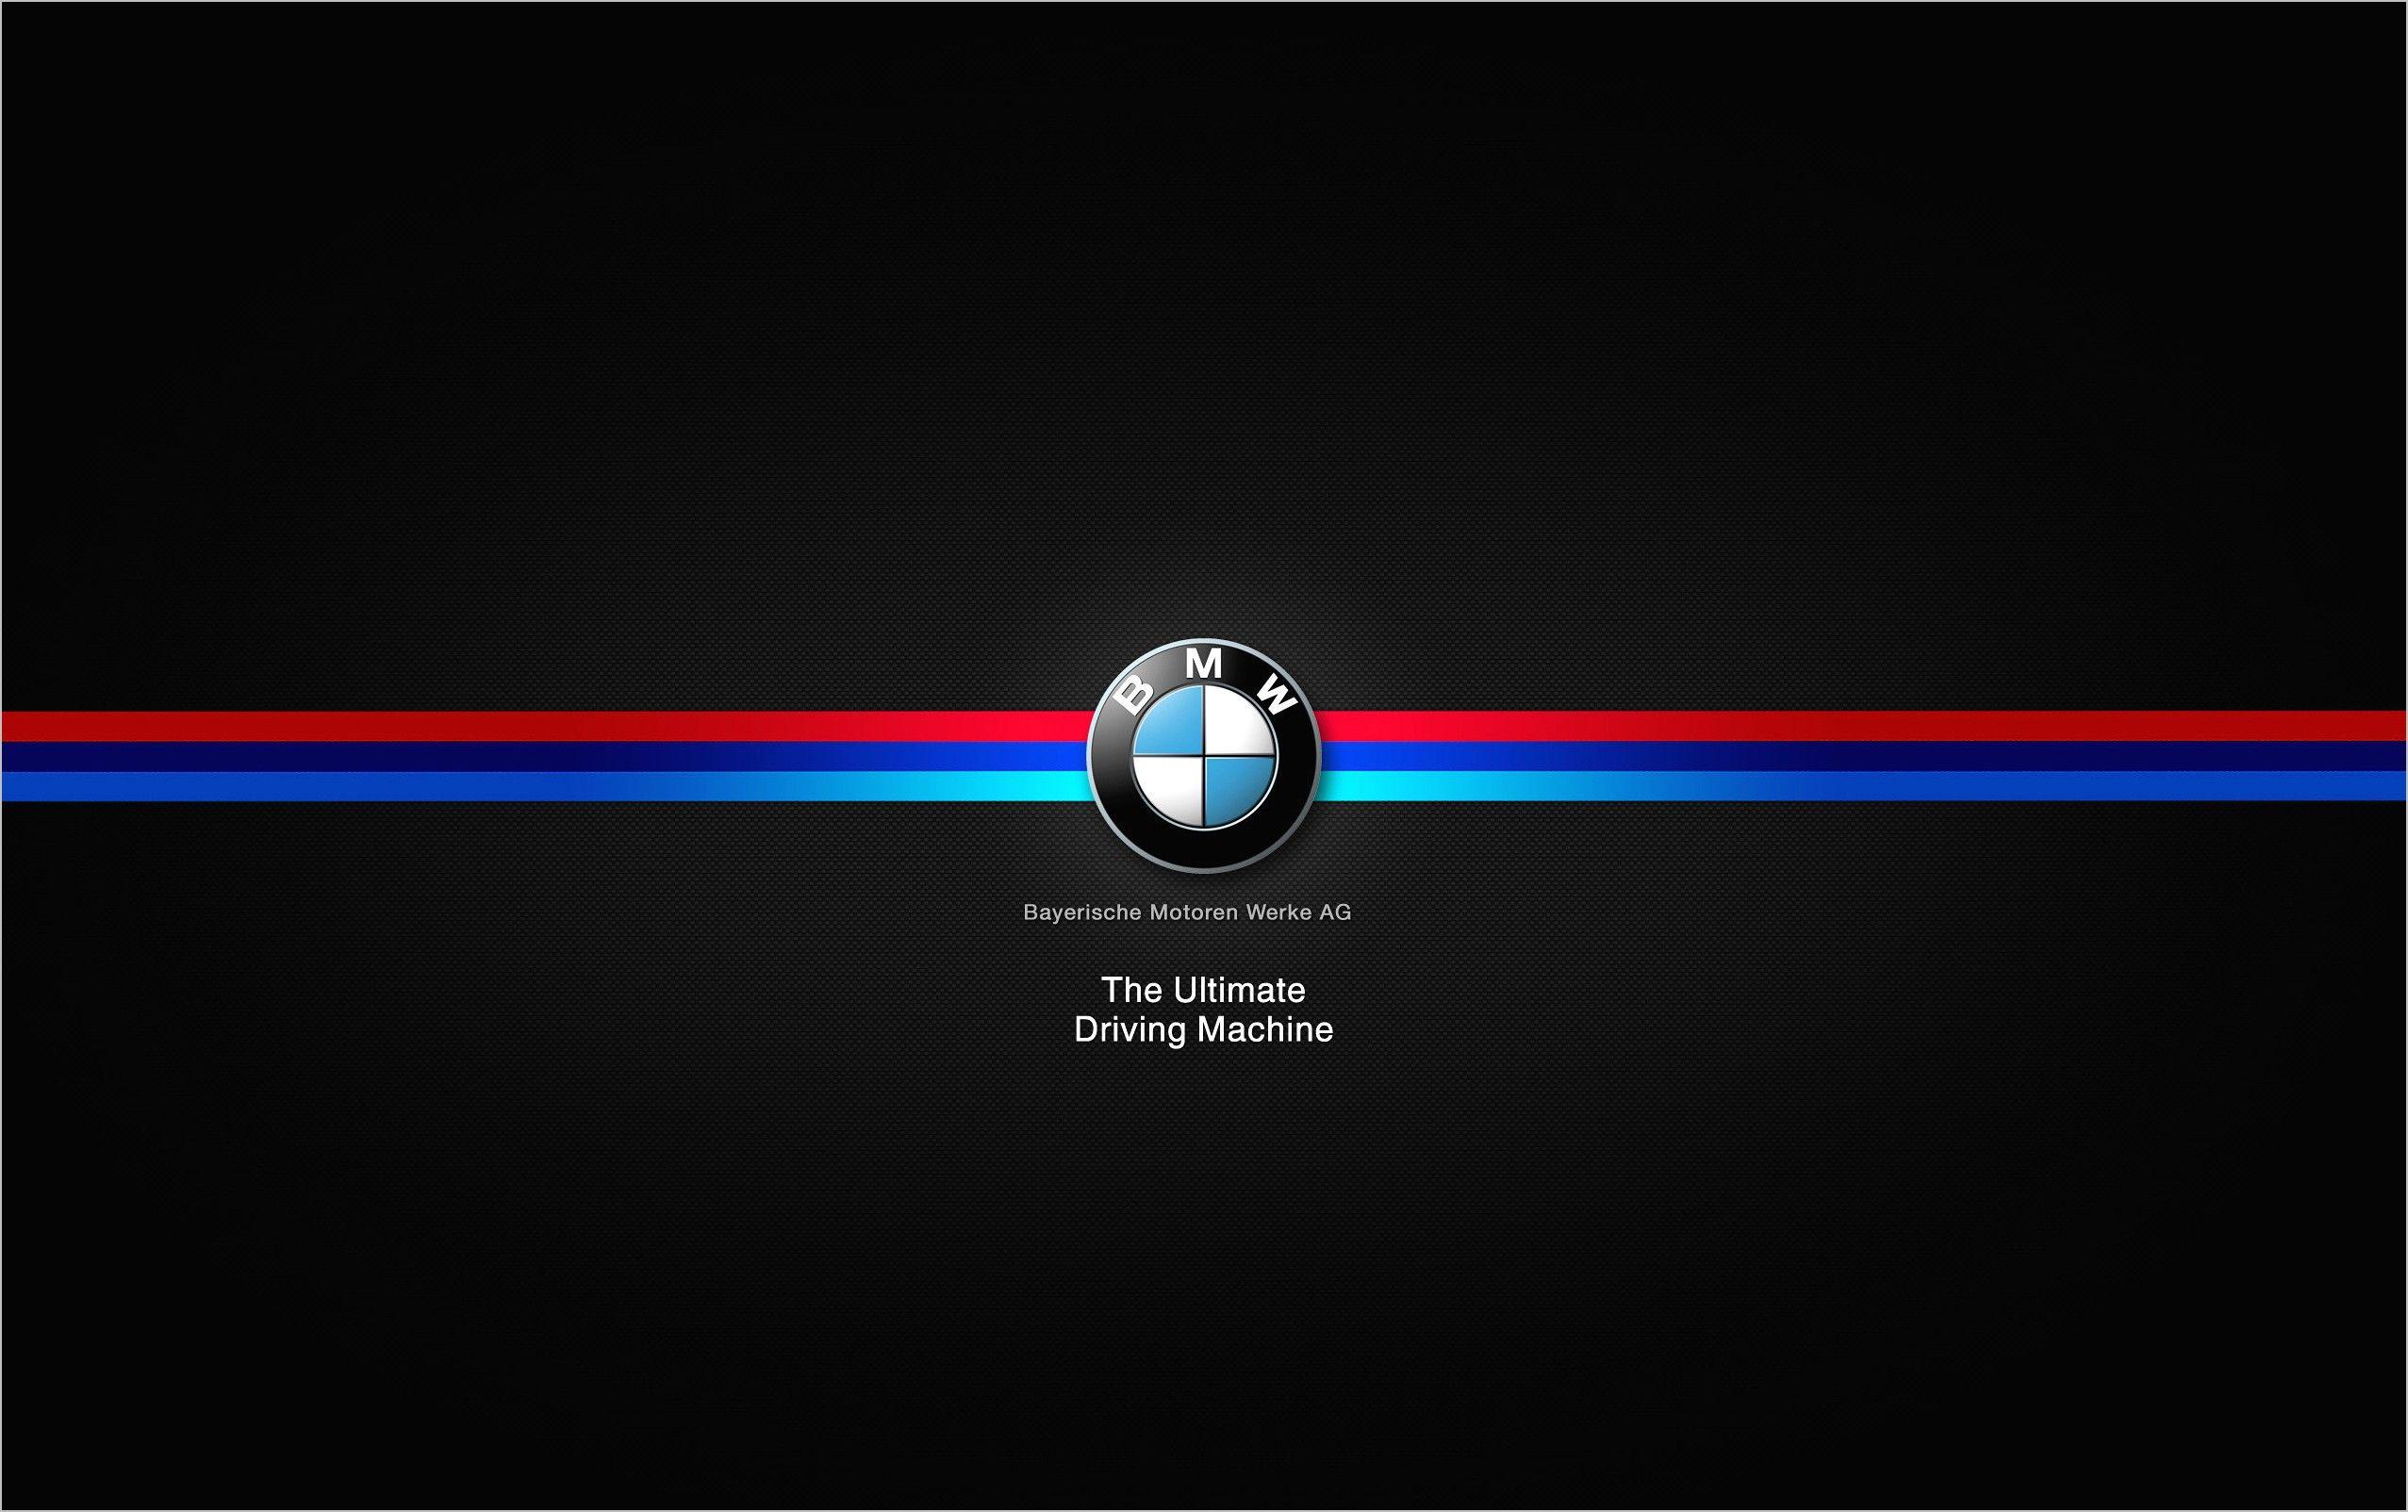 Bmw Logo Vertical Wallpaper 4k